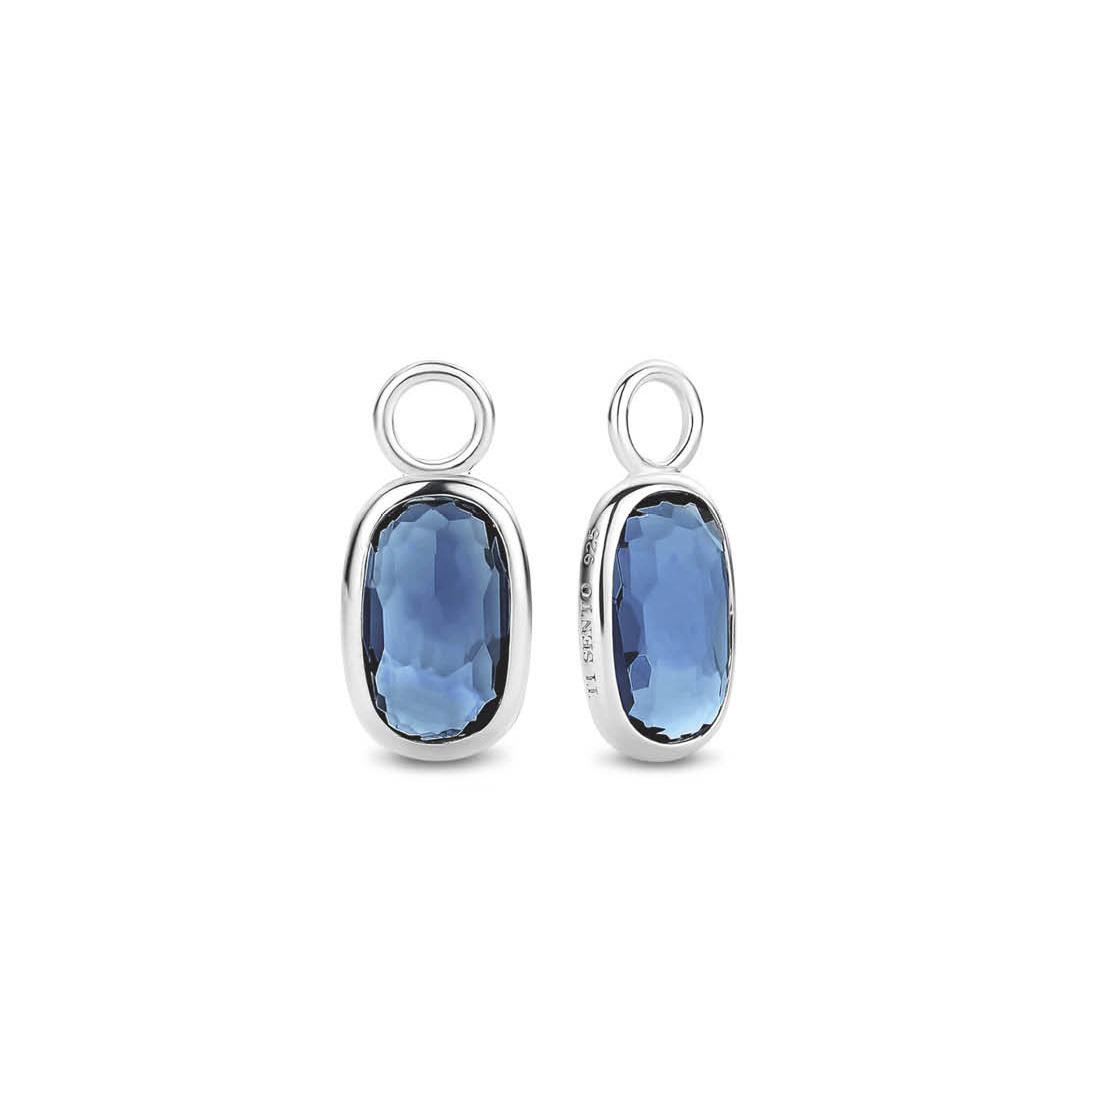 TI SENTO-Milano 9199DB Oorringcharms zilver-blauw